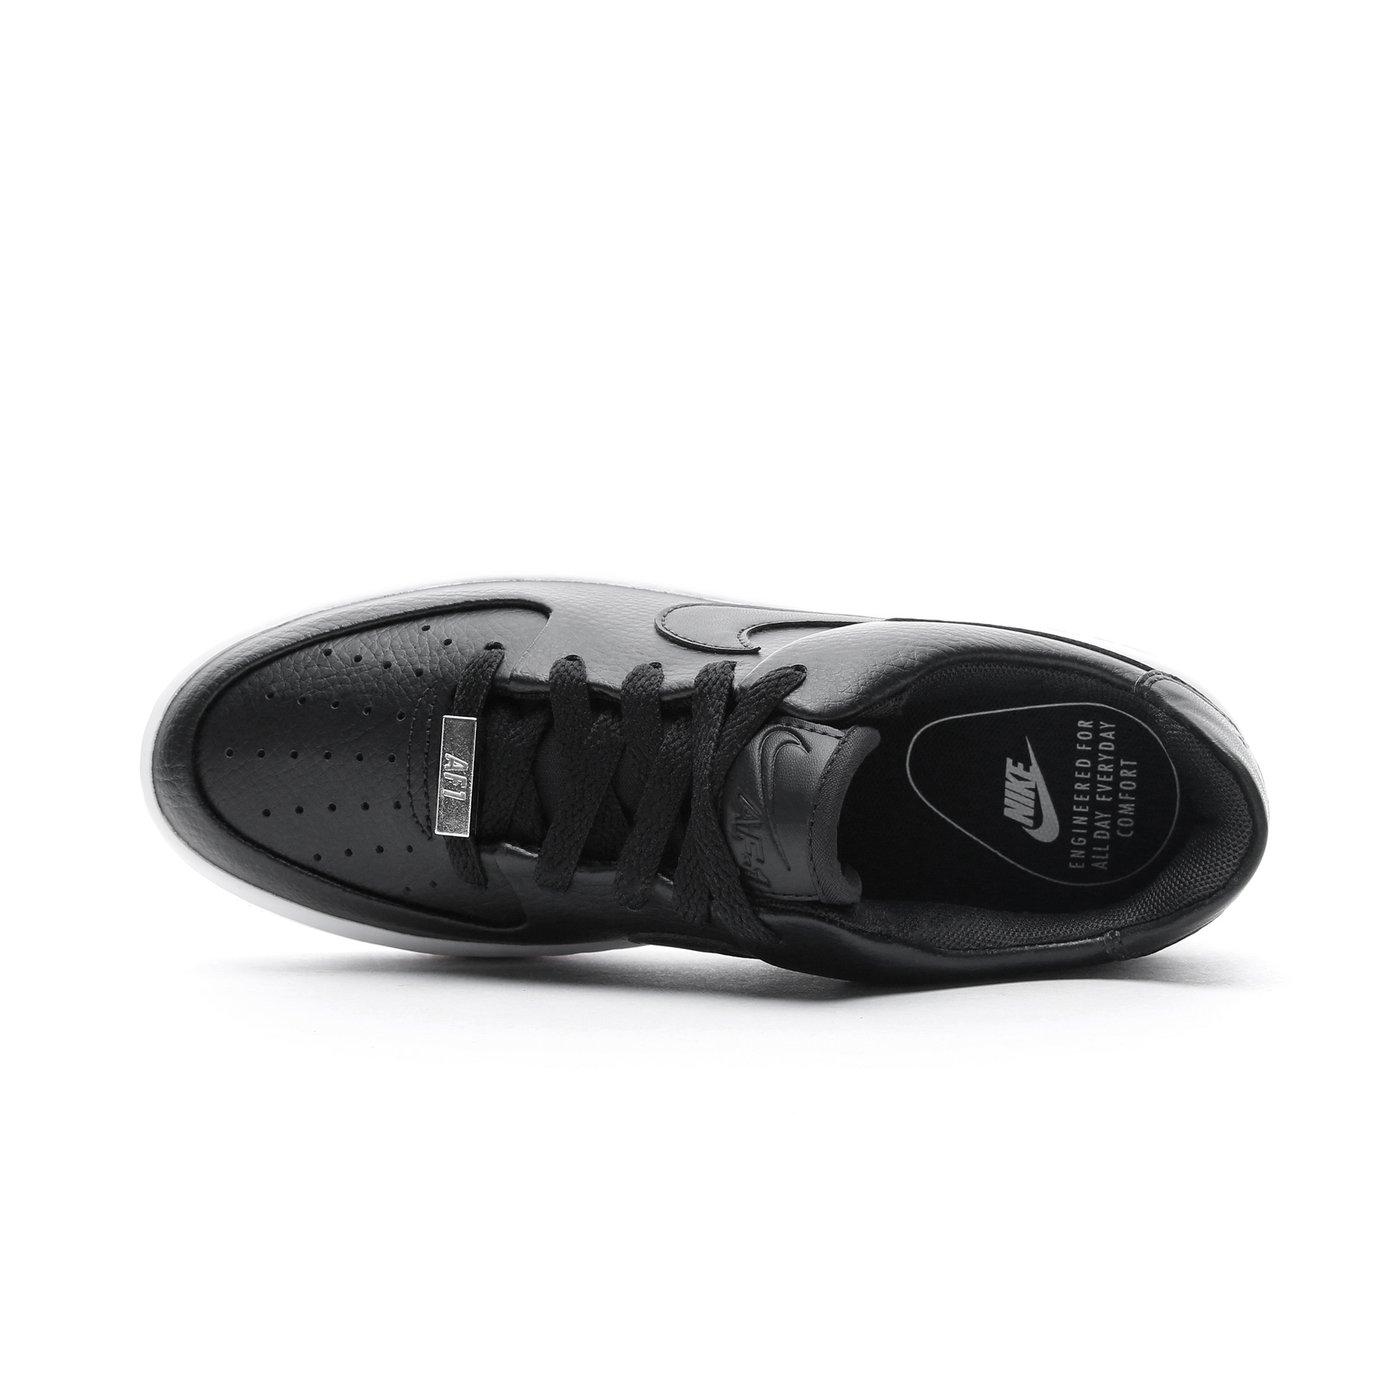 Nike Air Force 1 Sage Low Kadın Siyah Spor Ayakkabı